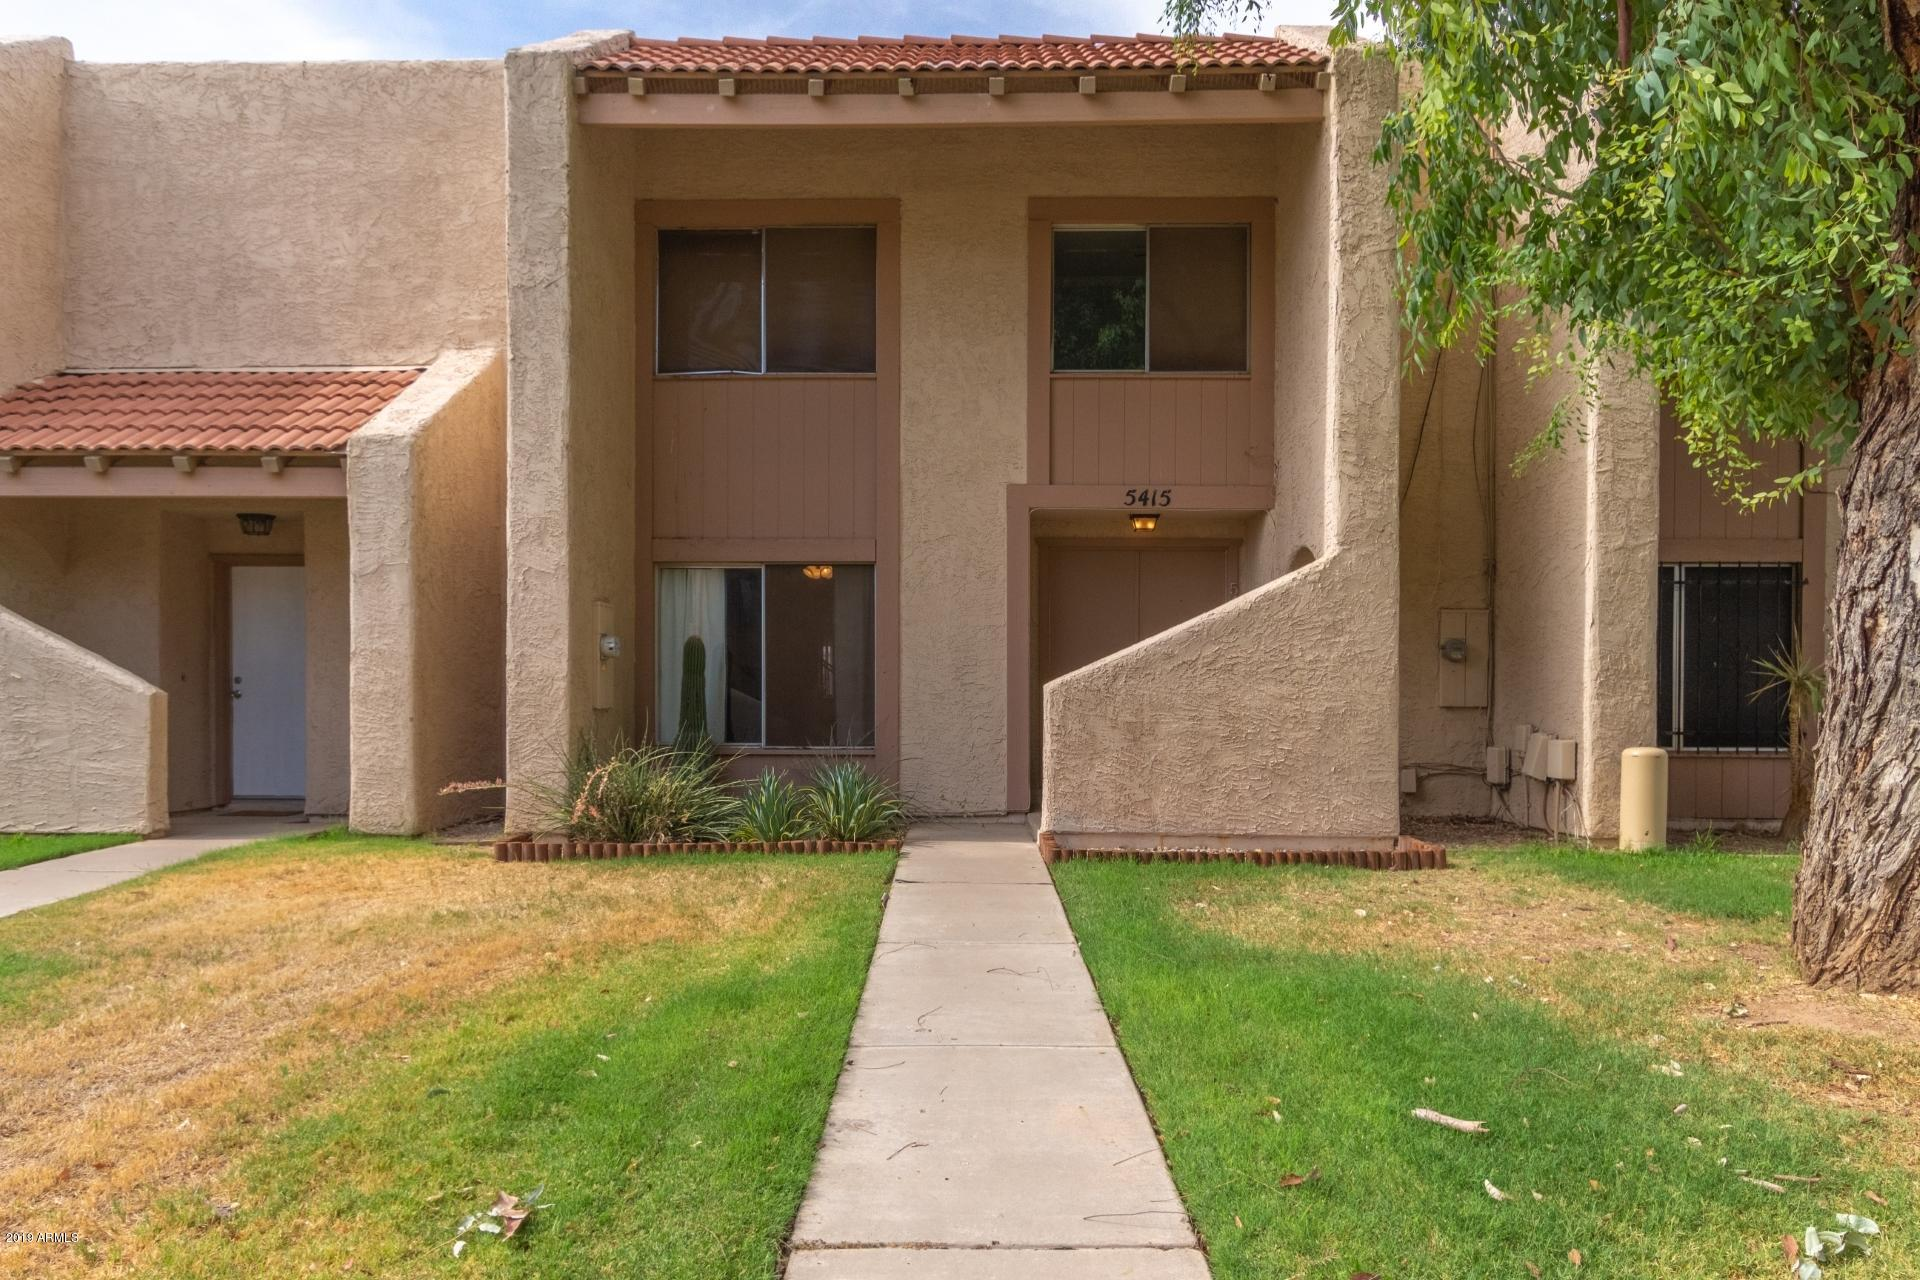 Photo of 5415 W LAURIE Lane, Glendale, AZ 85302